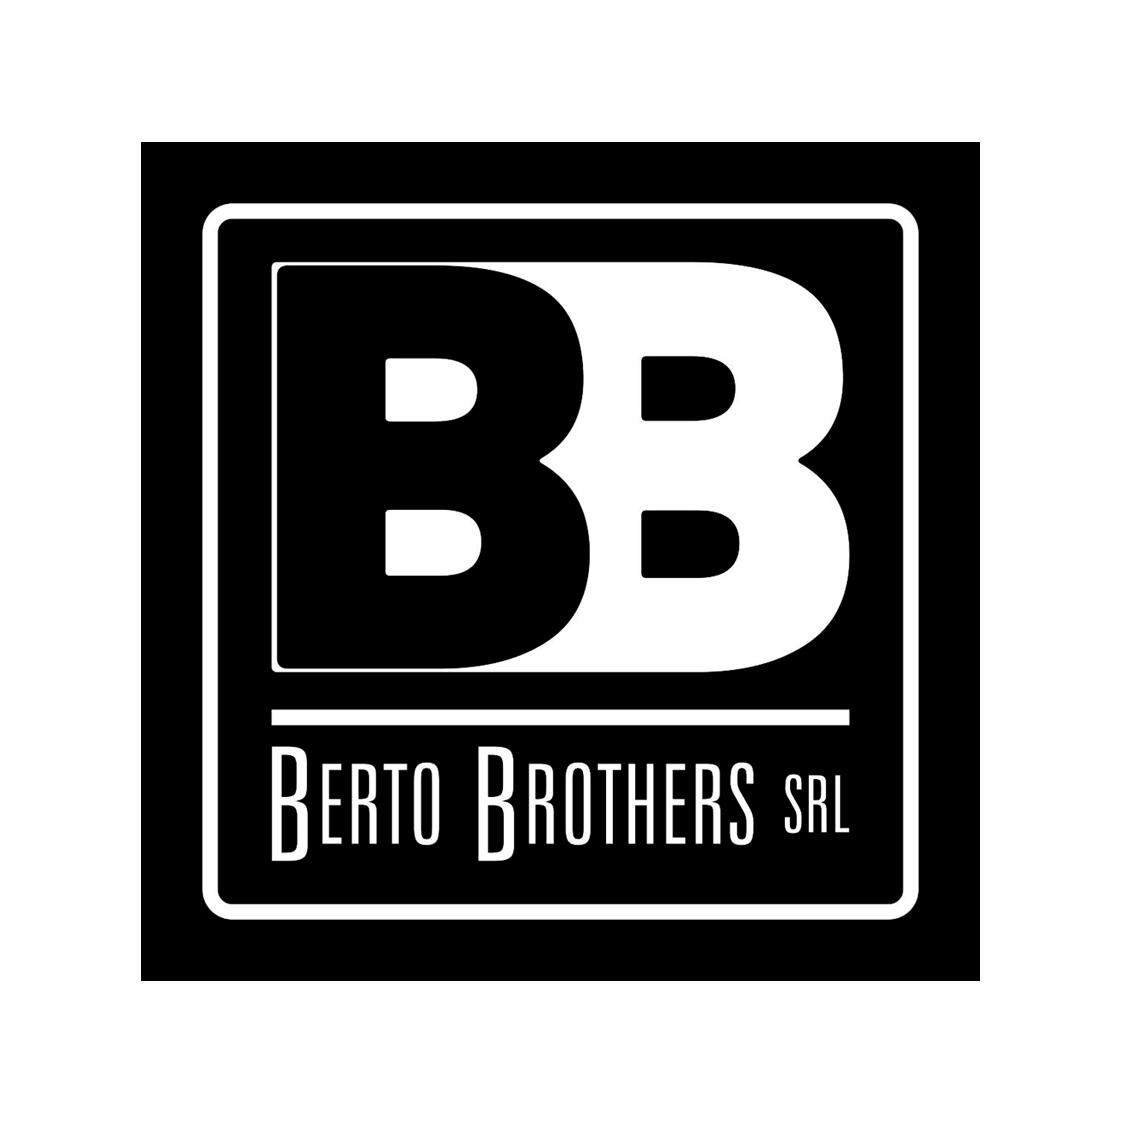 BERTO BROTHERS